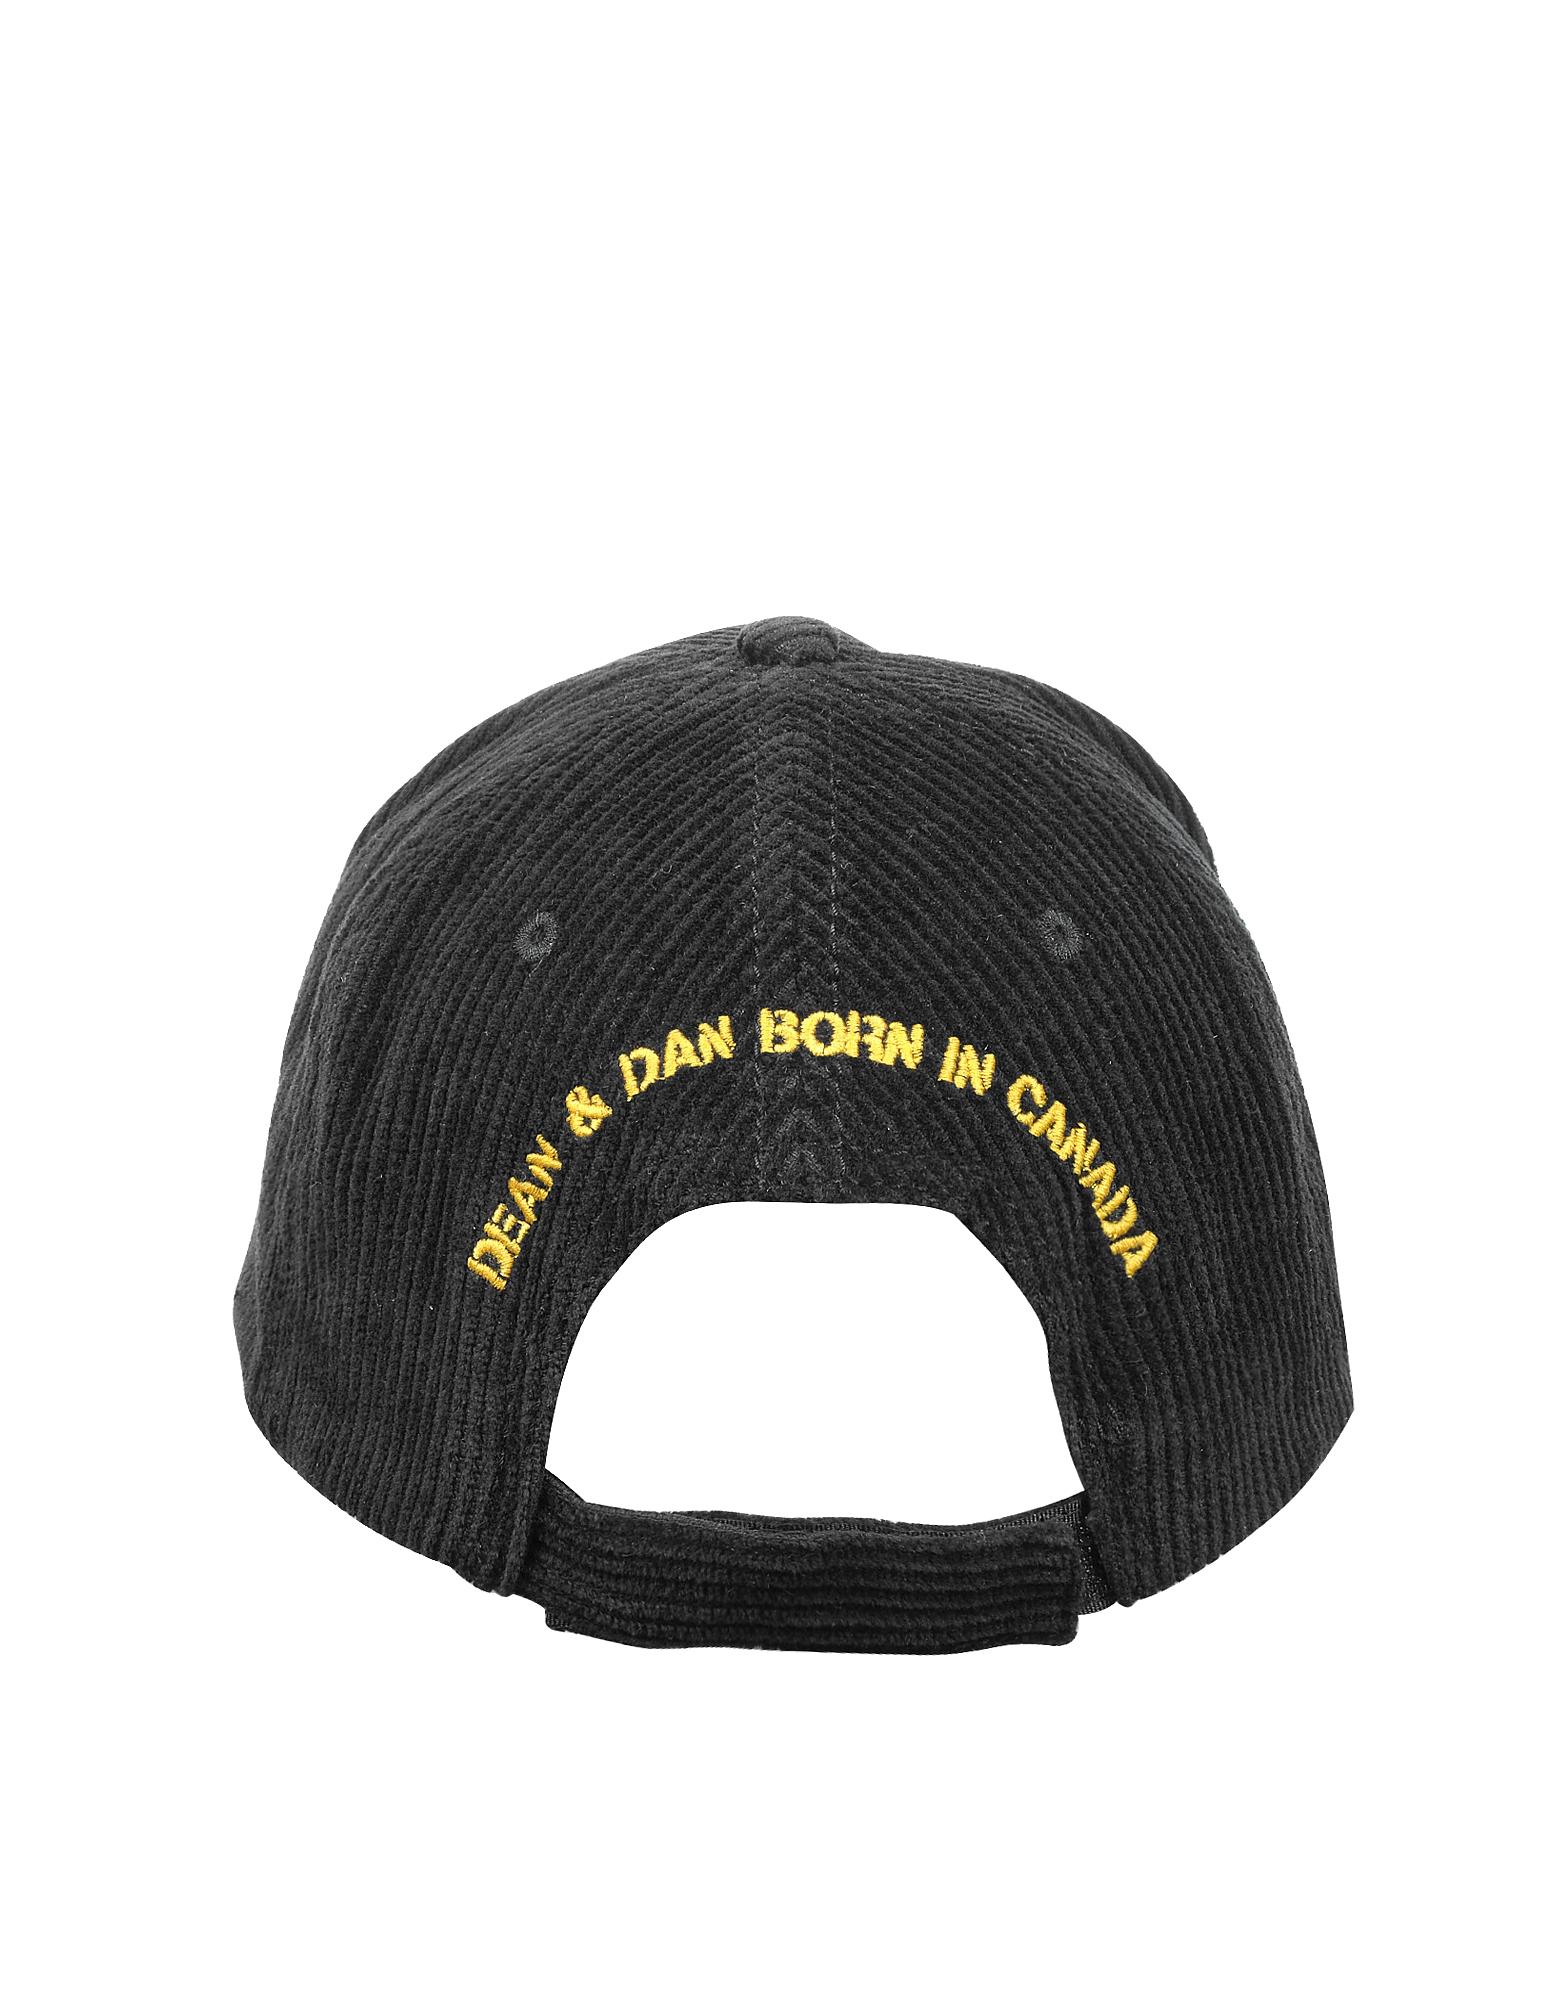 Punk Rock Black Cotton Baseball Cap от Forzieri.com INT